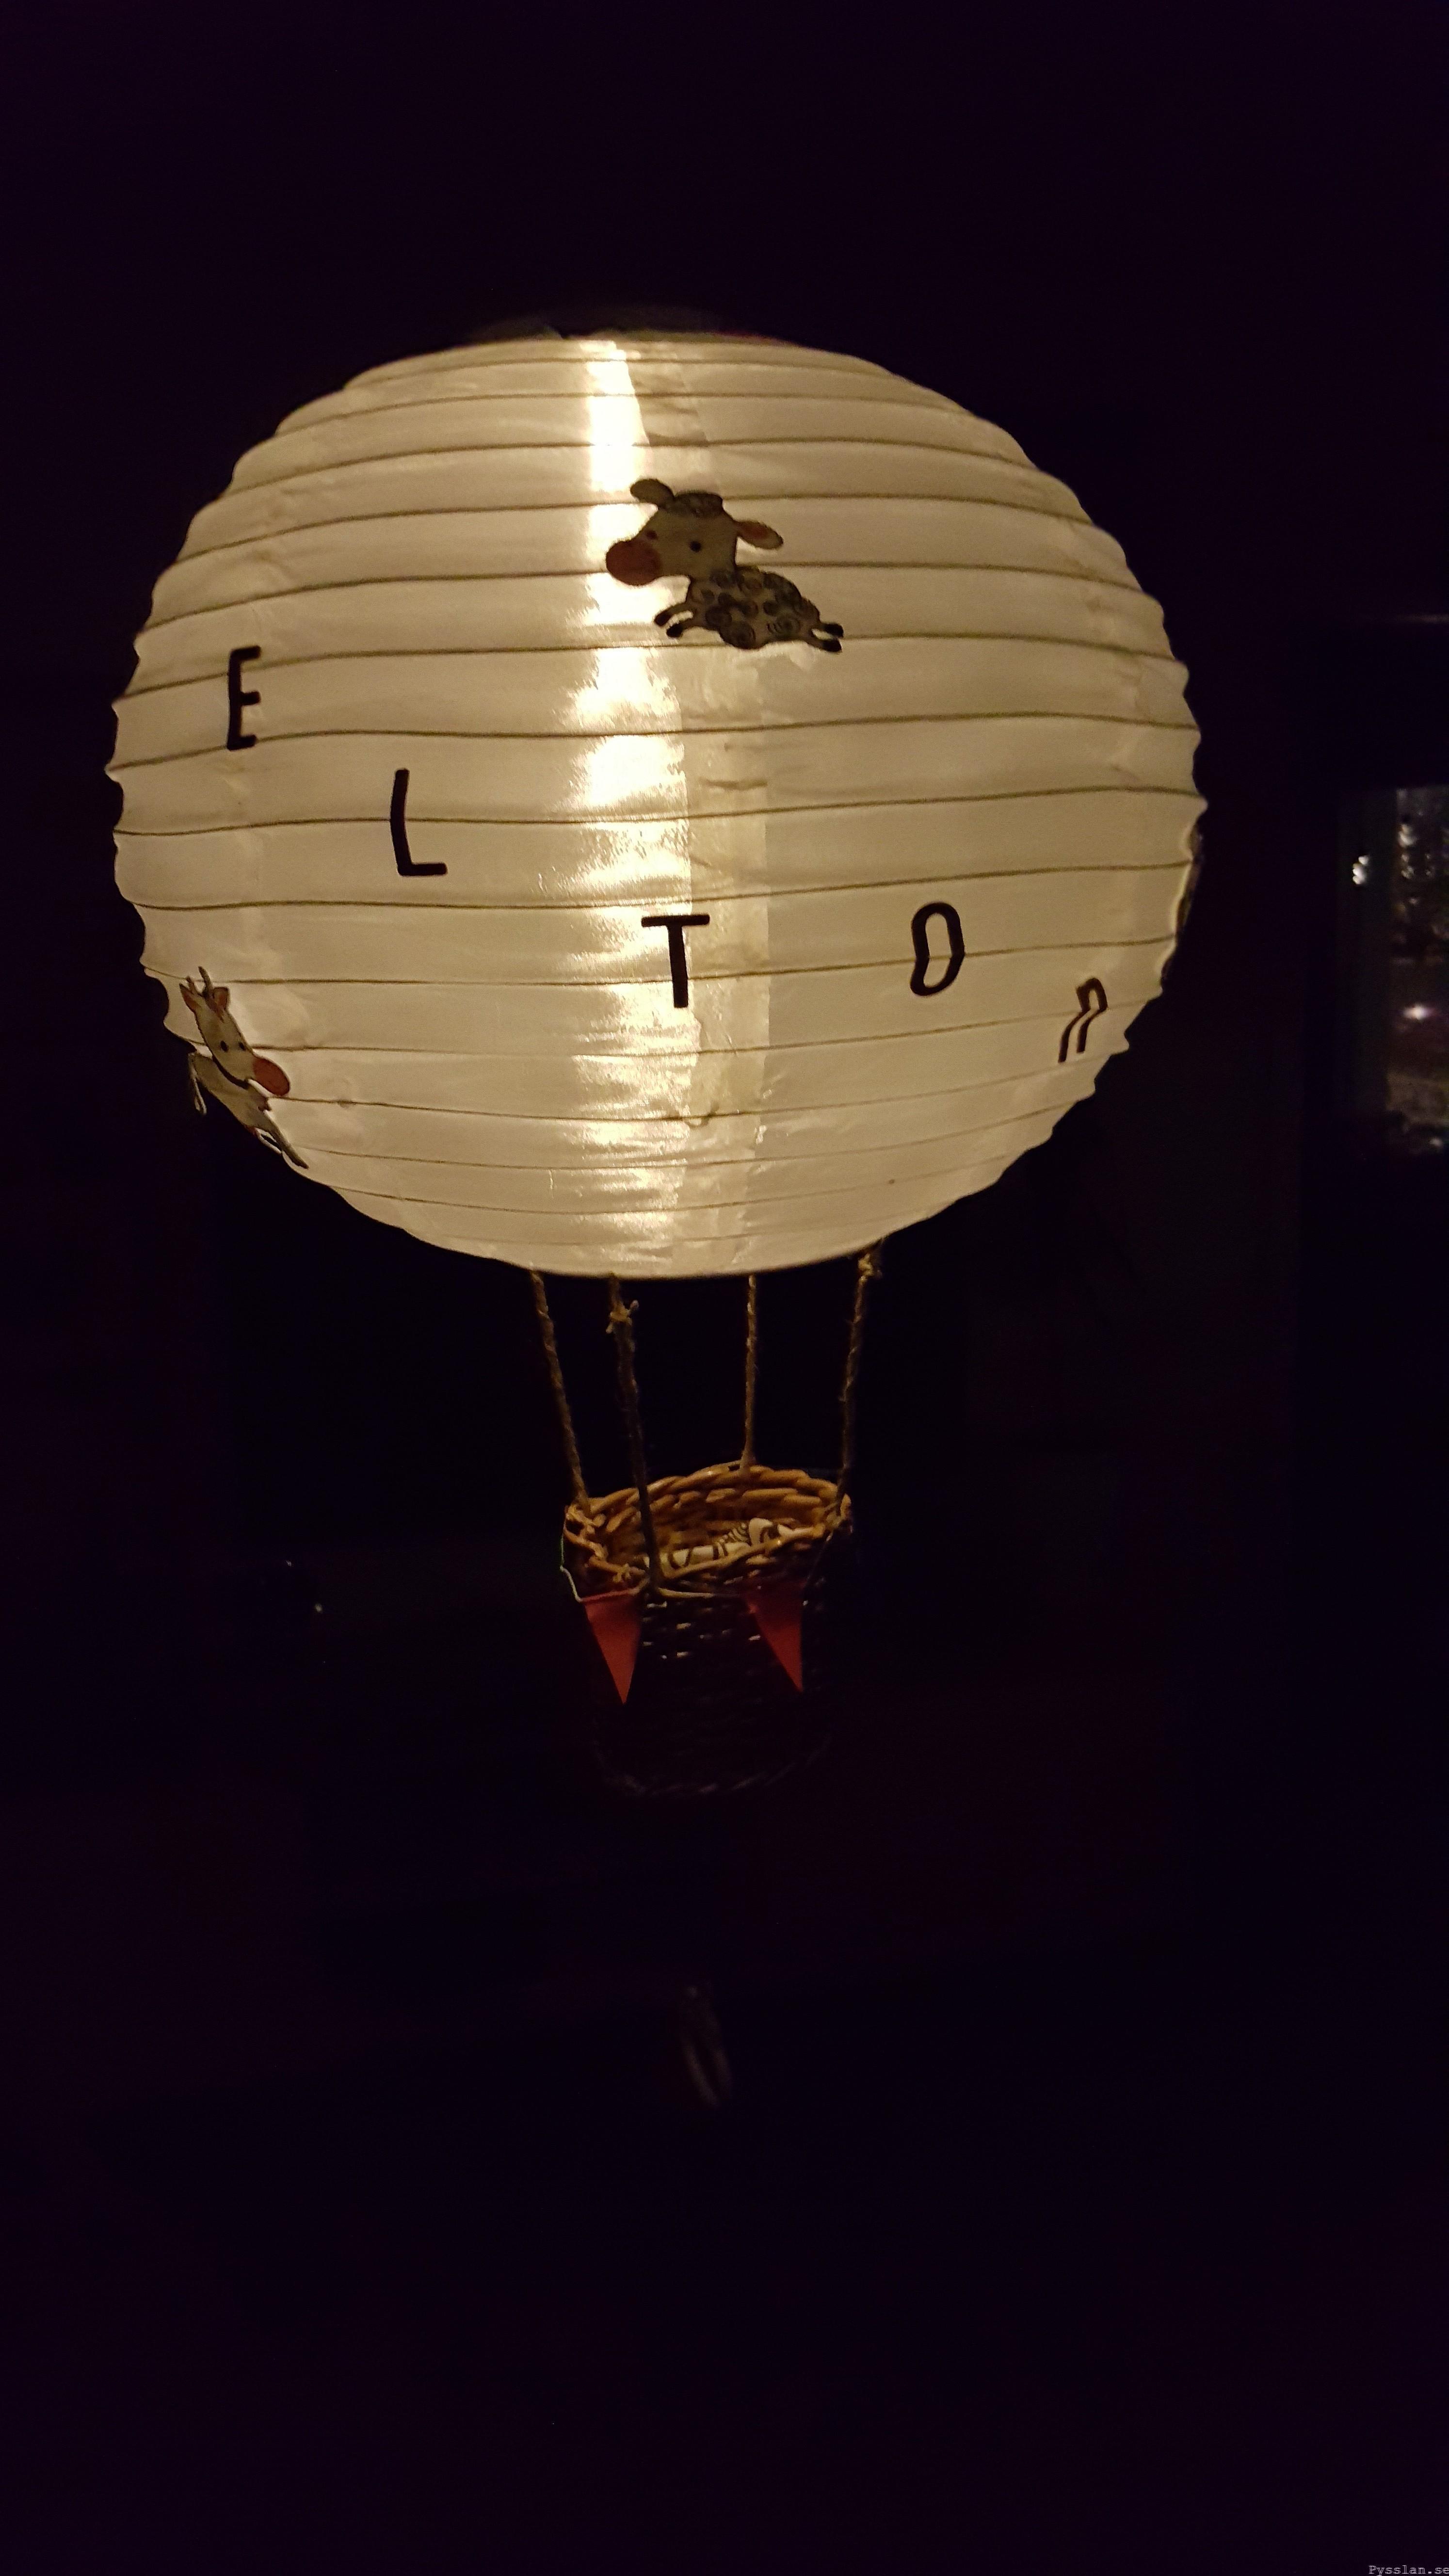 Luftballong doppresent baby speldosa pysslan blogg nattlampa